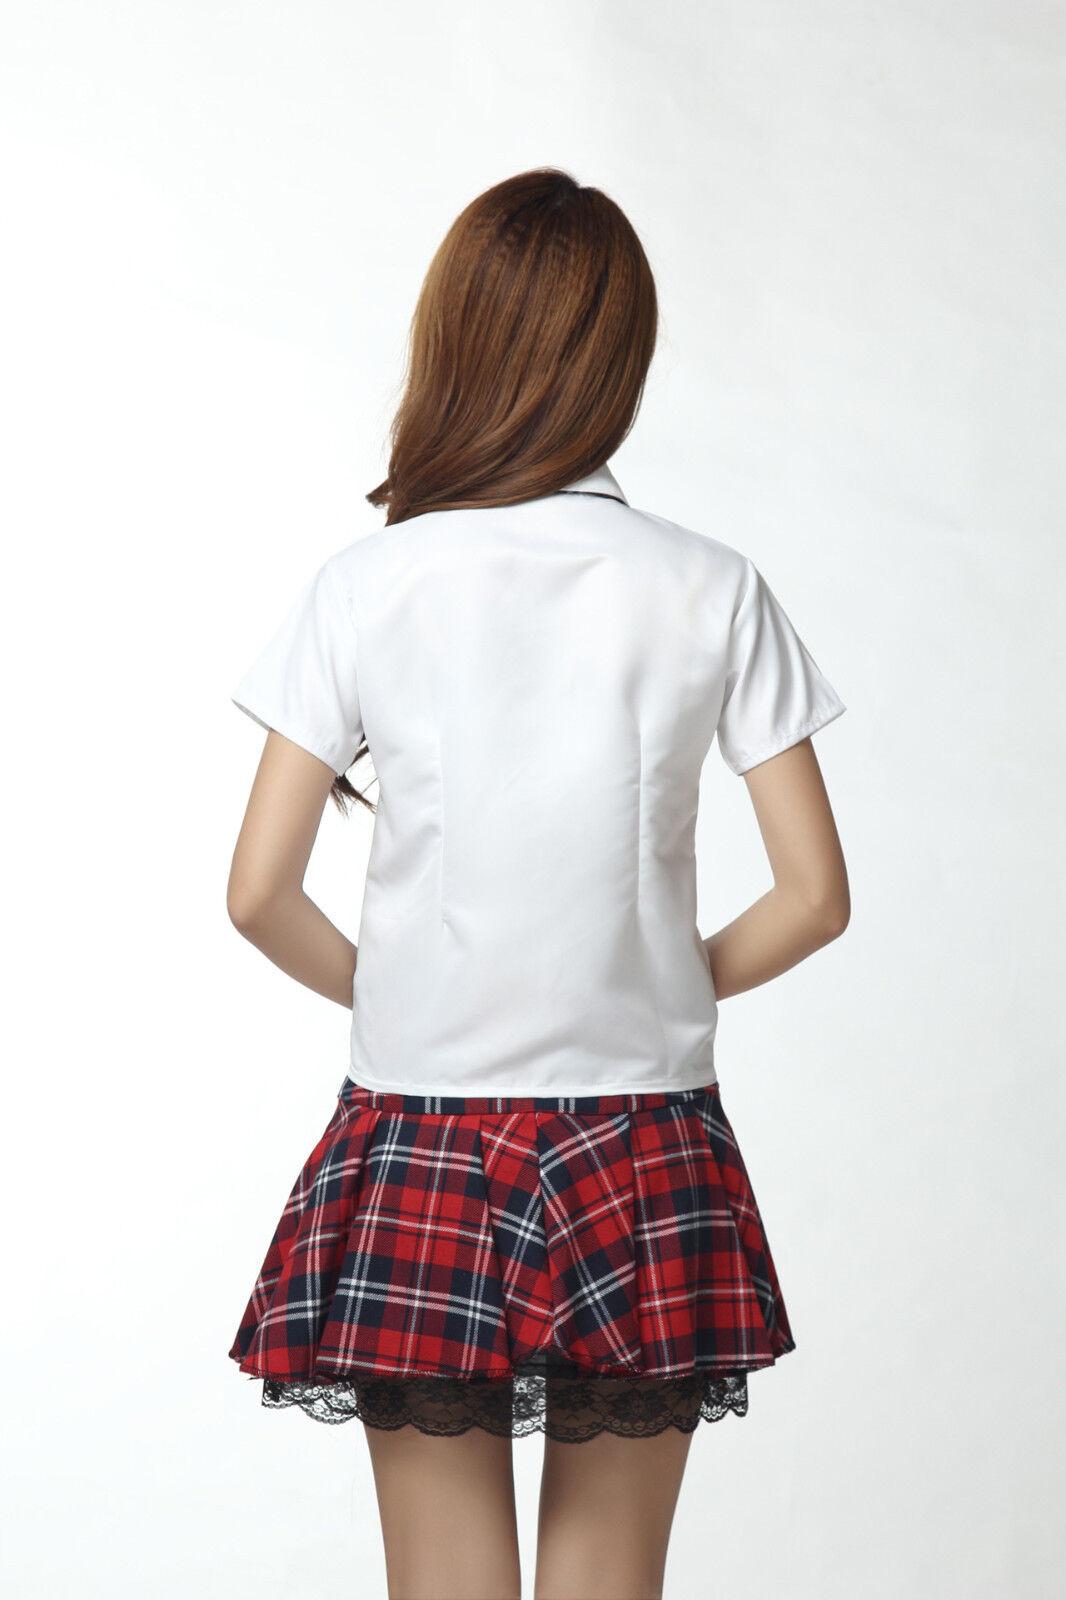 Korean Japanese School Girl Student Uniform W Suit Jacket